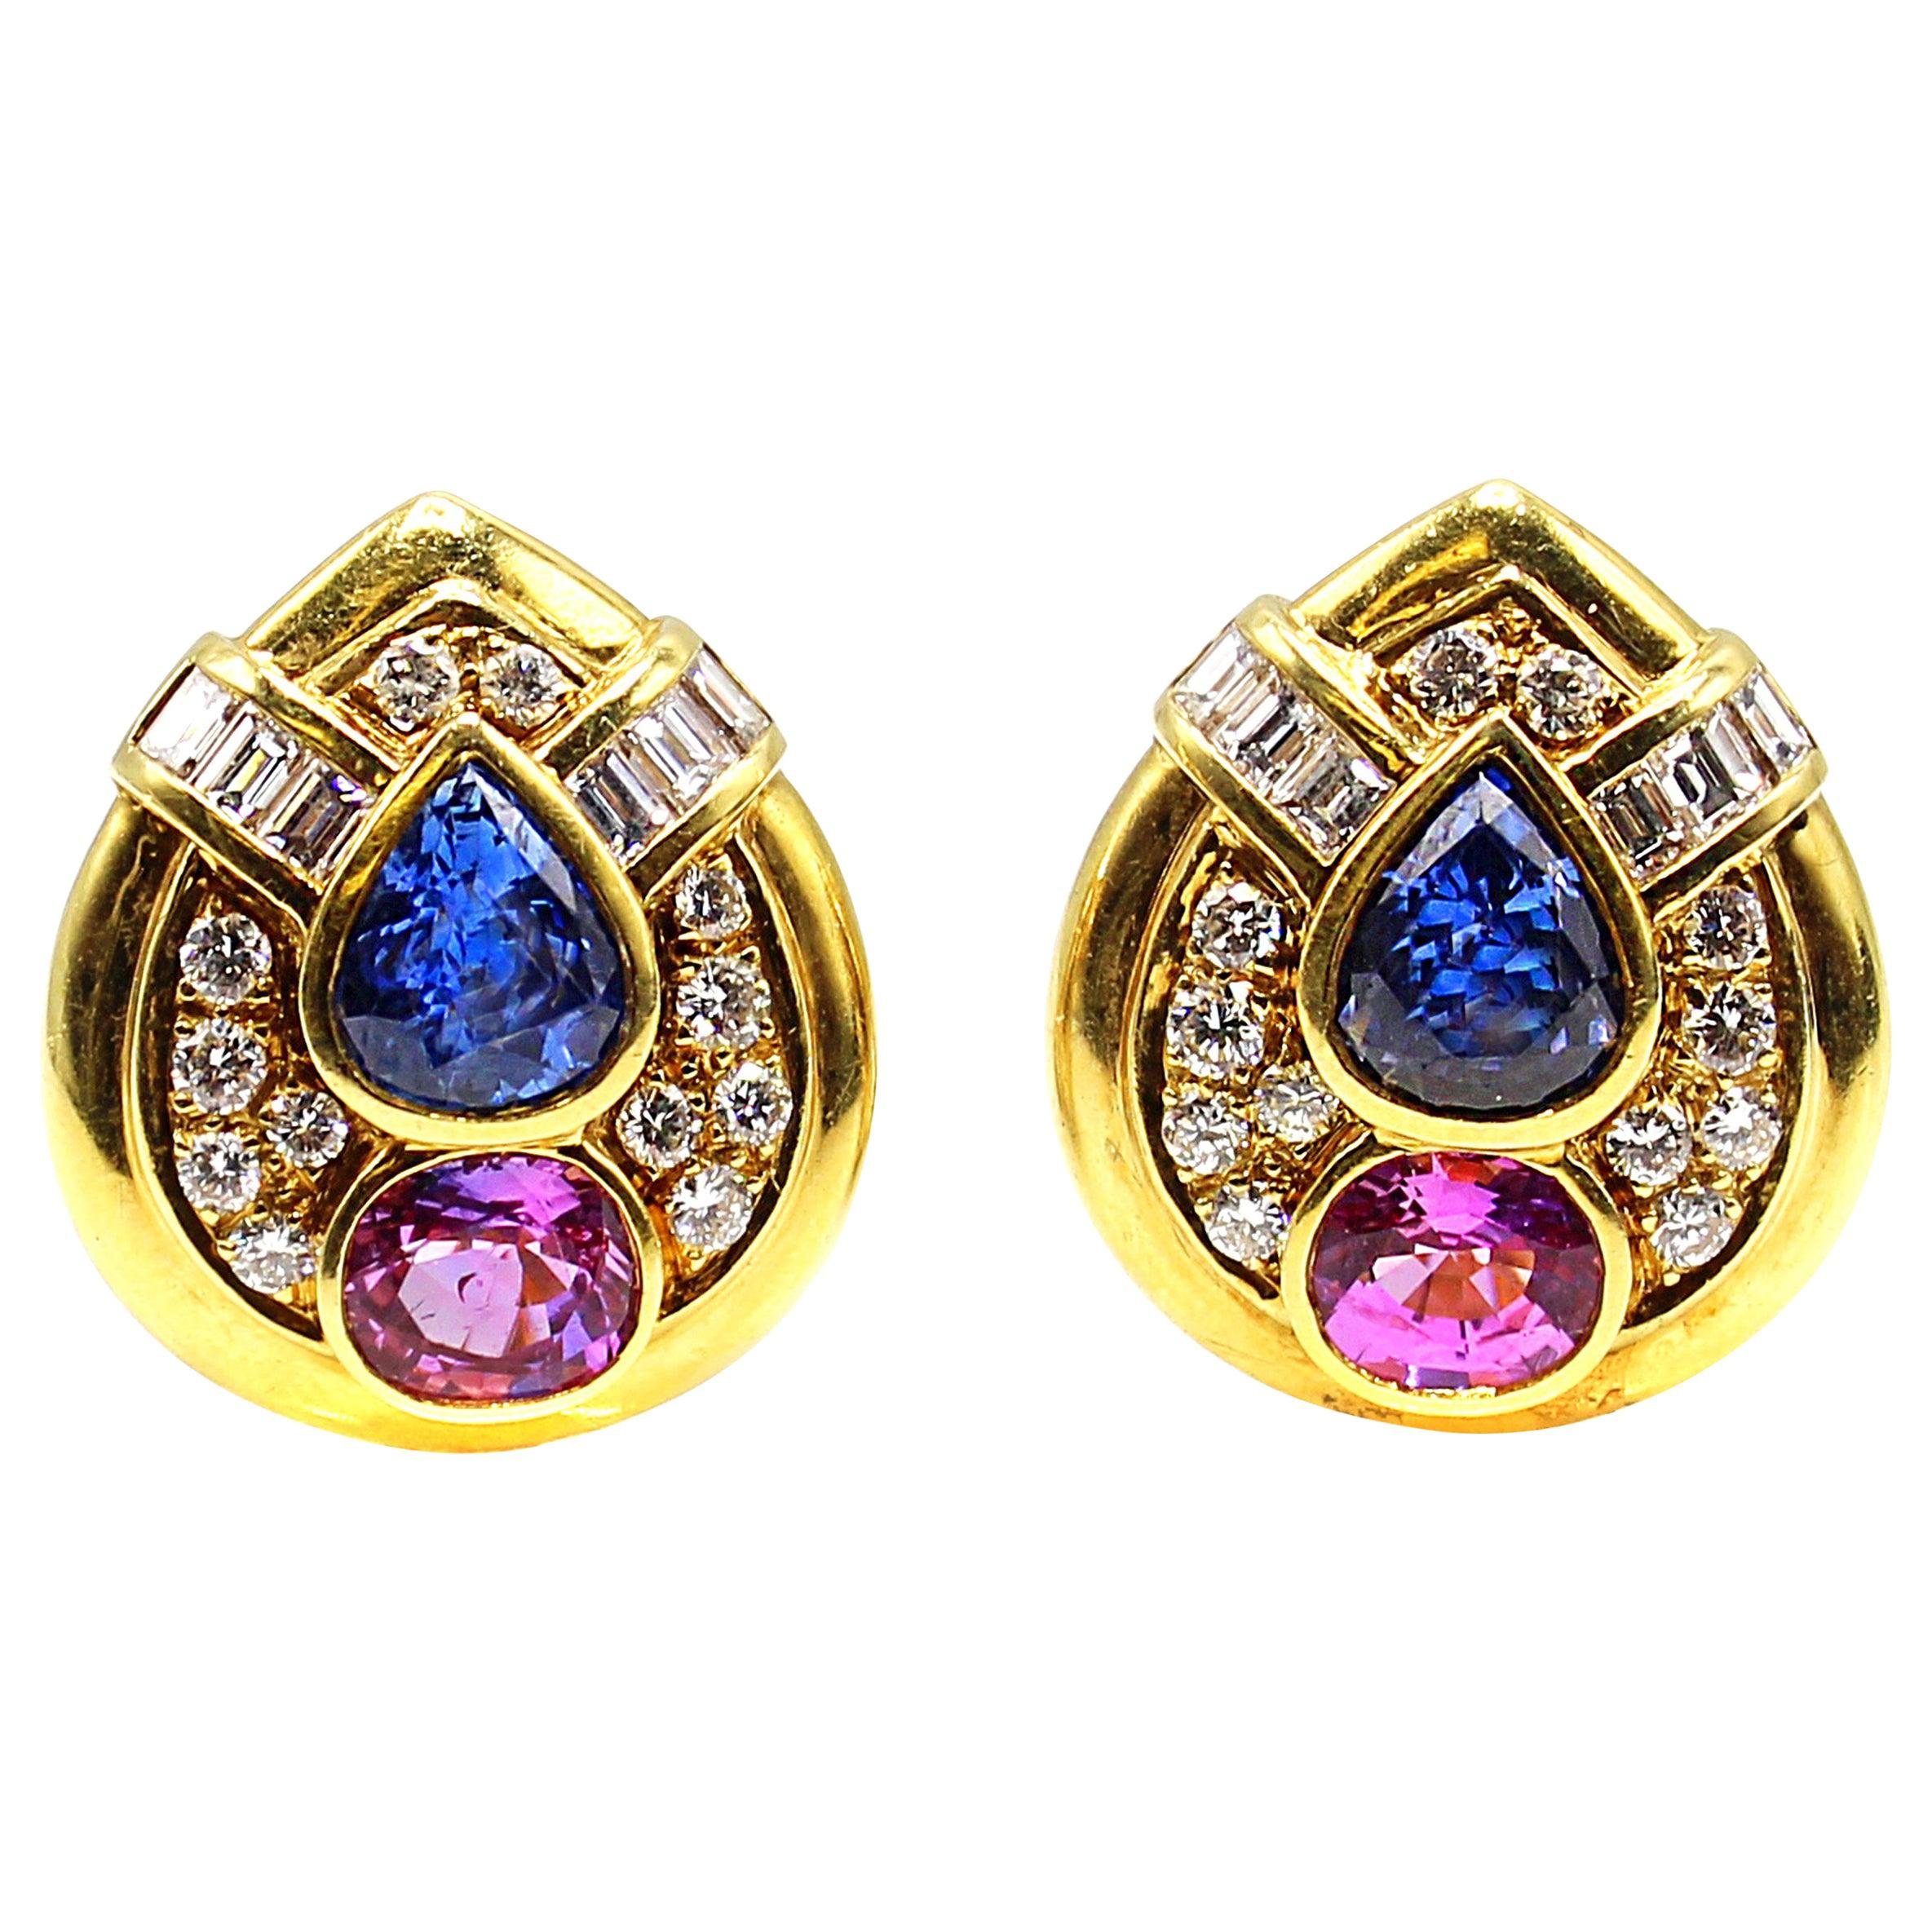 1980s Pink and Blue Sapphire Diamond 18 Karat Gold Teardrop Ear Clips